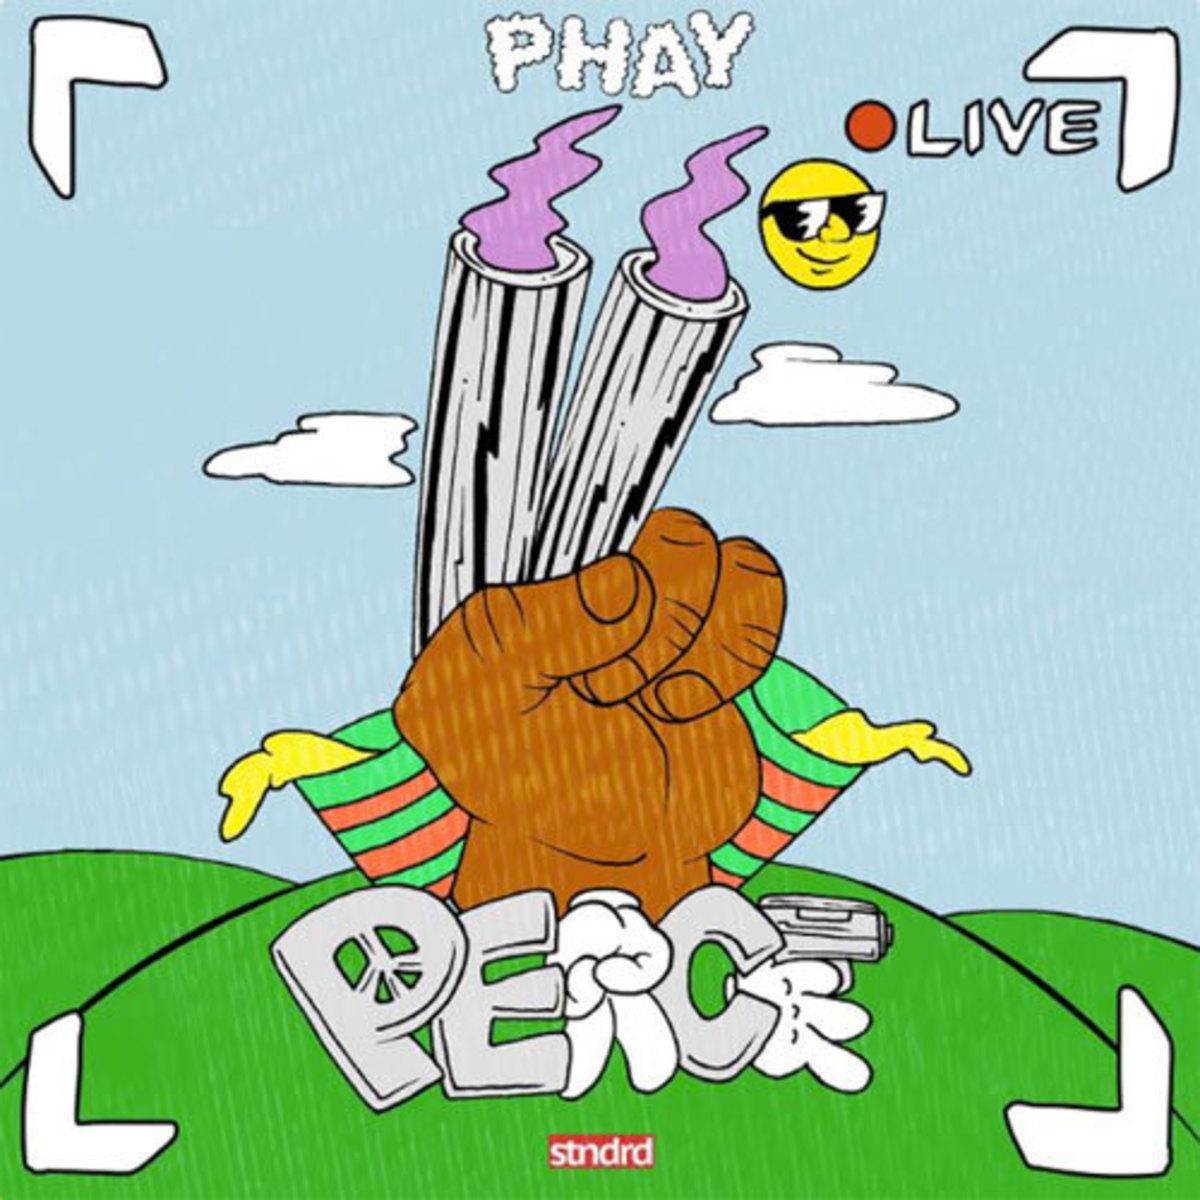 phay-peace-live.jpg